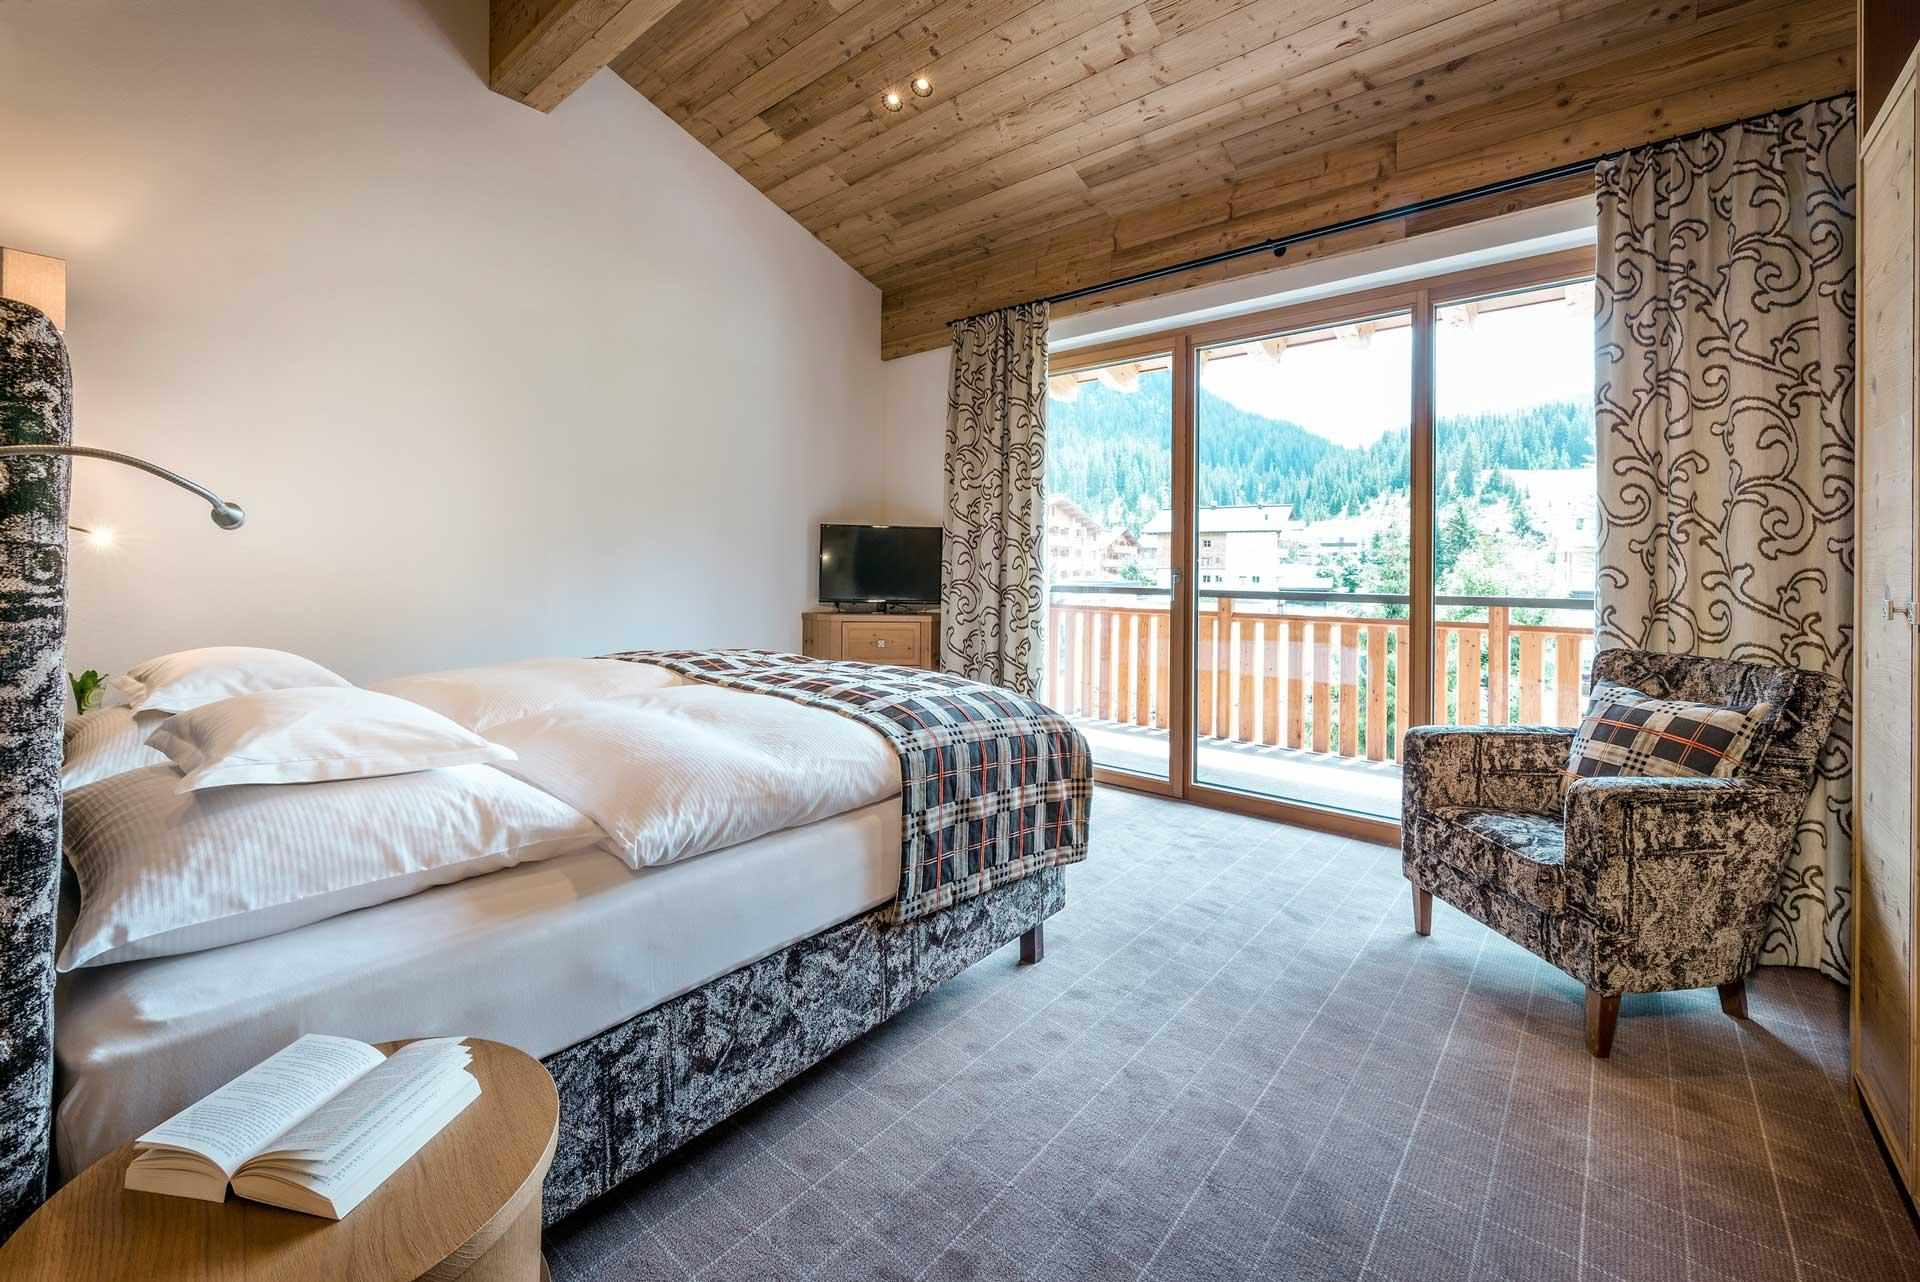 zimmer tagespreise in lech im sommer hotel auenhof. Black Bedroom Furniture Sets. Home Design Ideas